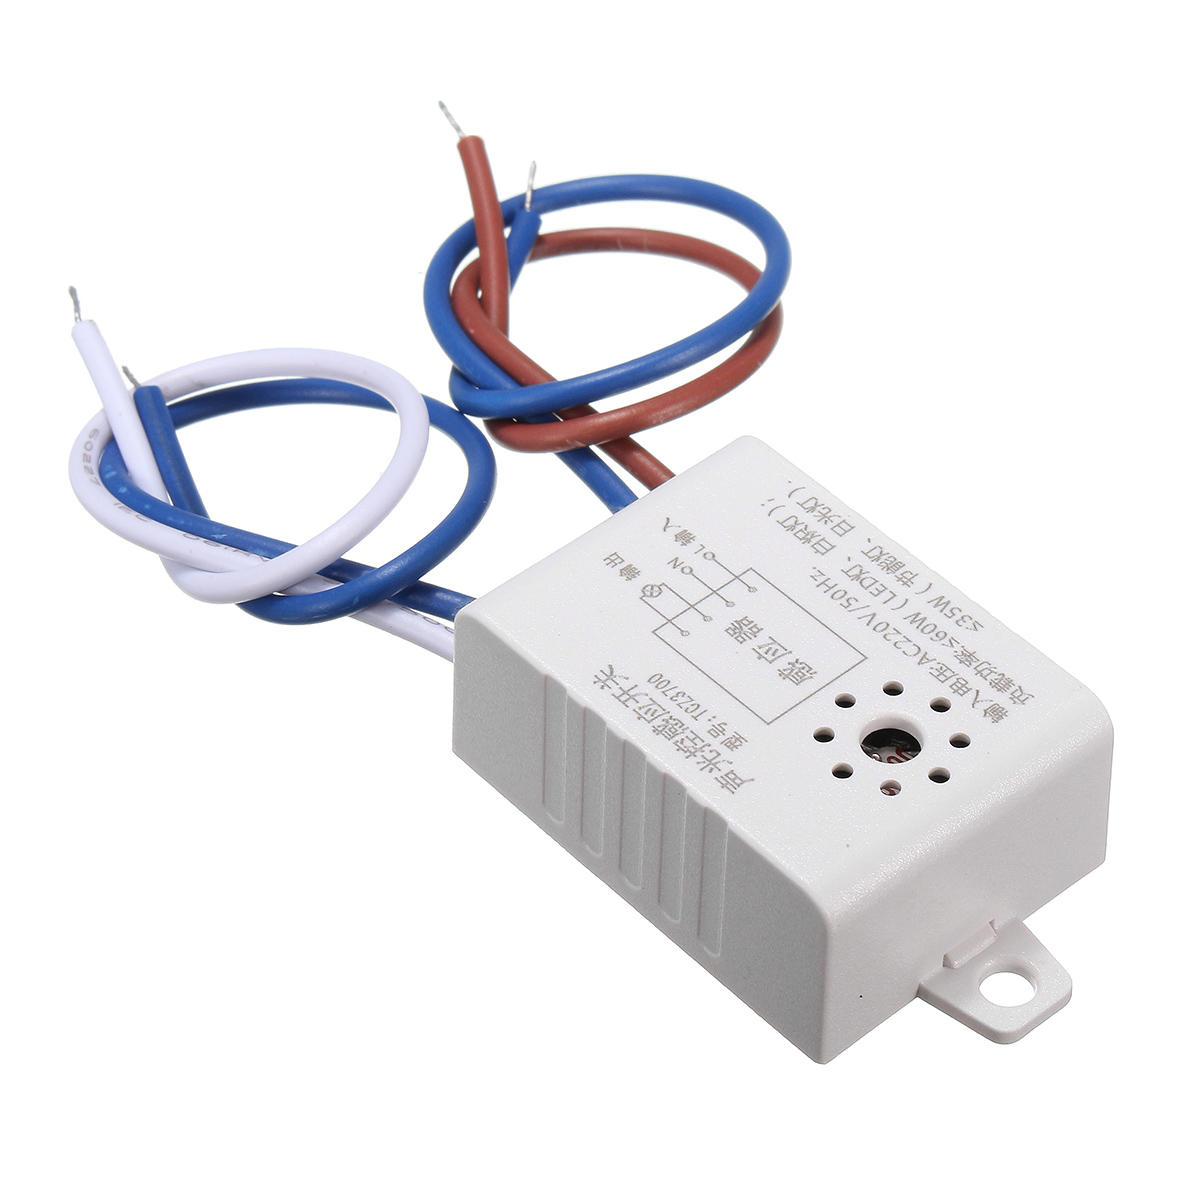 Module 220V Detector Auto On Off Sound Voice Sensor Intelligent Light Switch